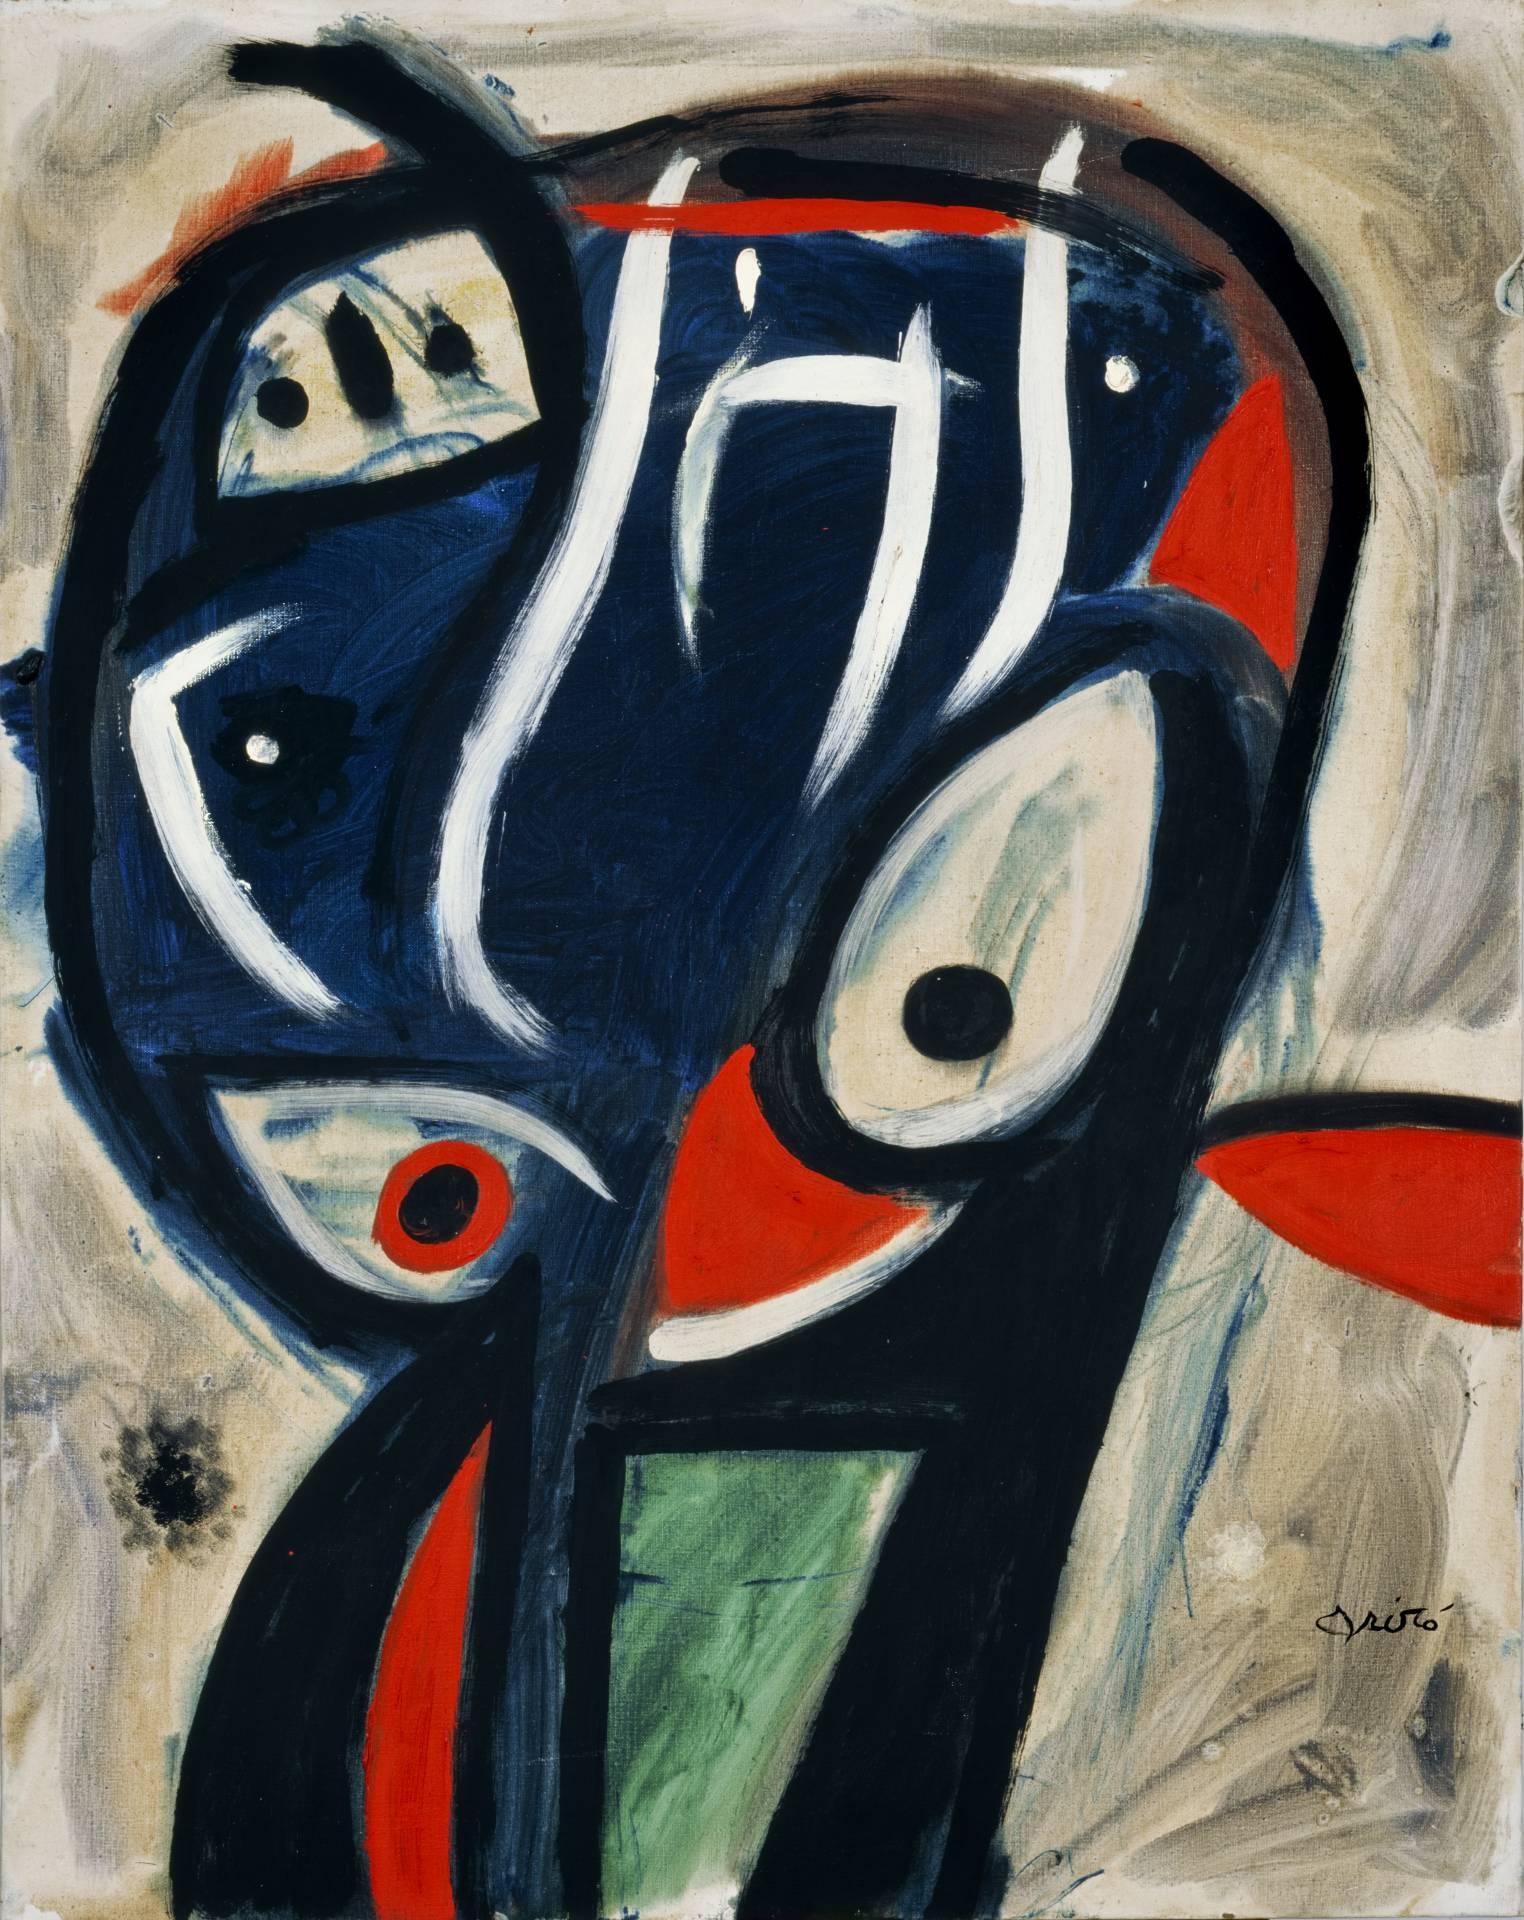 'Cabeza de pájaro' (1977), de Joan Miró. Óleo sobre tela.